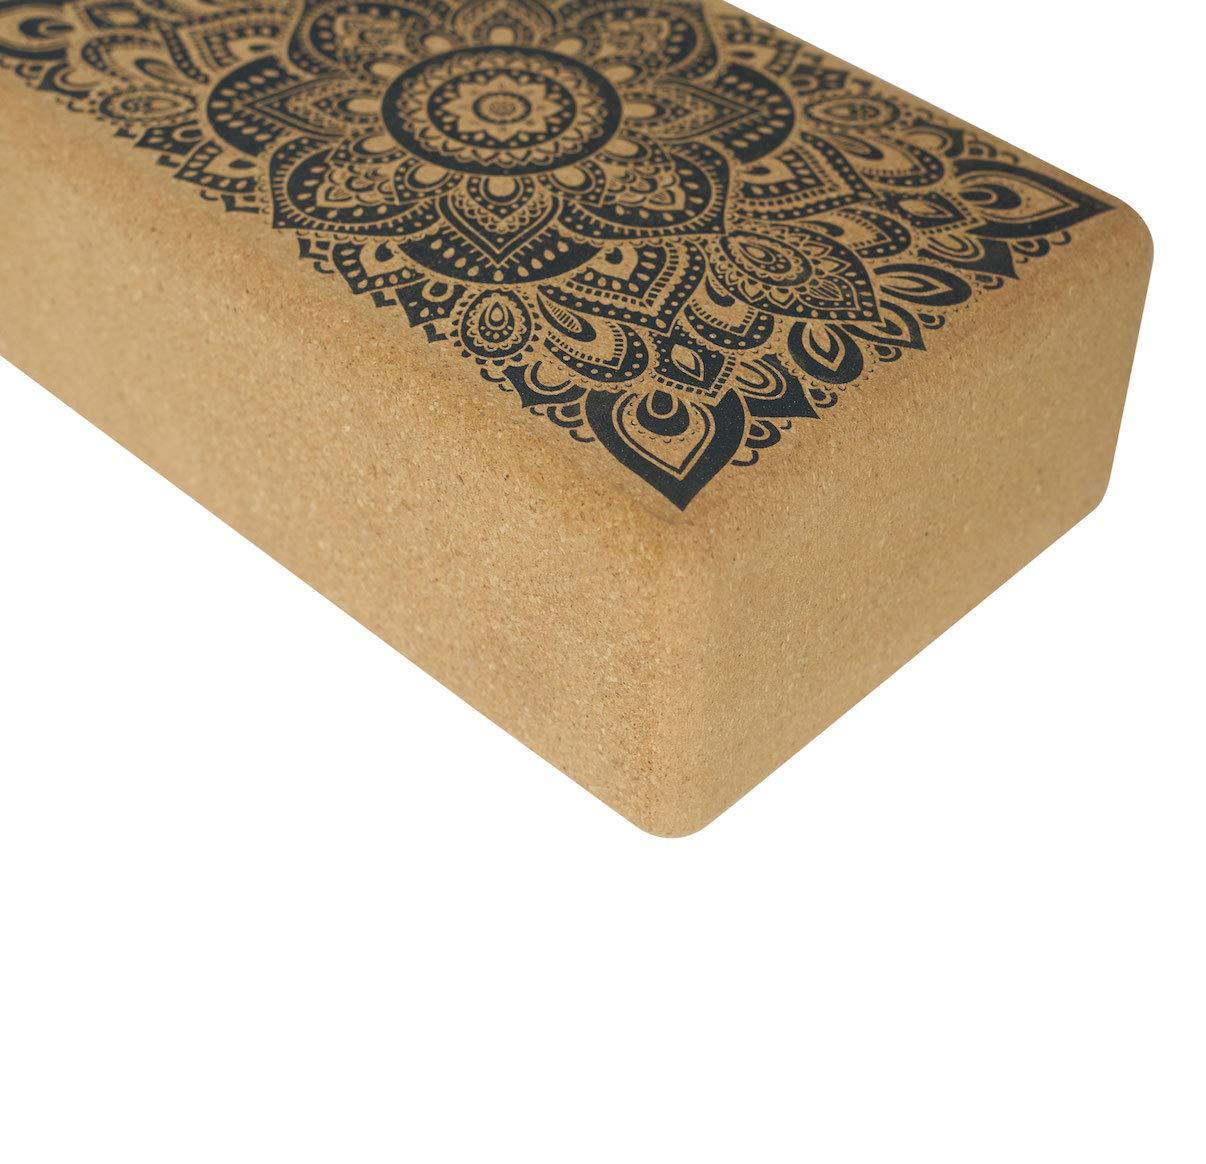 The Block Eco Yoga Block Printed Non Slip Grip Designed to Improve Your Practice Premium Colorful Best Selling /& Travel Friendly Set Offer! YOGA DESIGN LAB